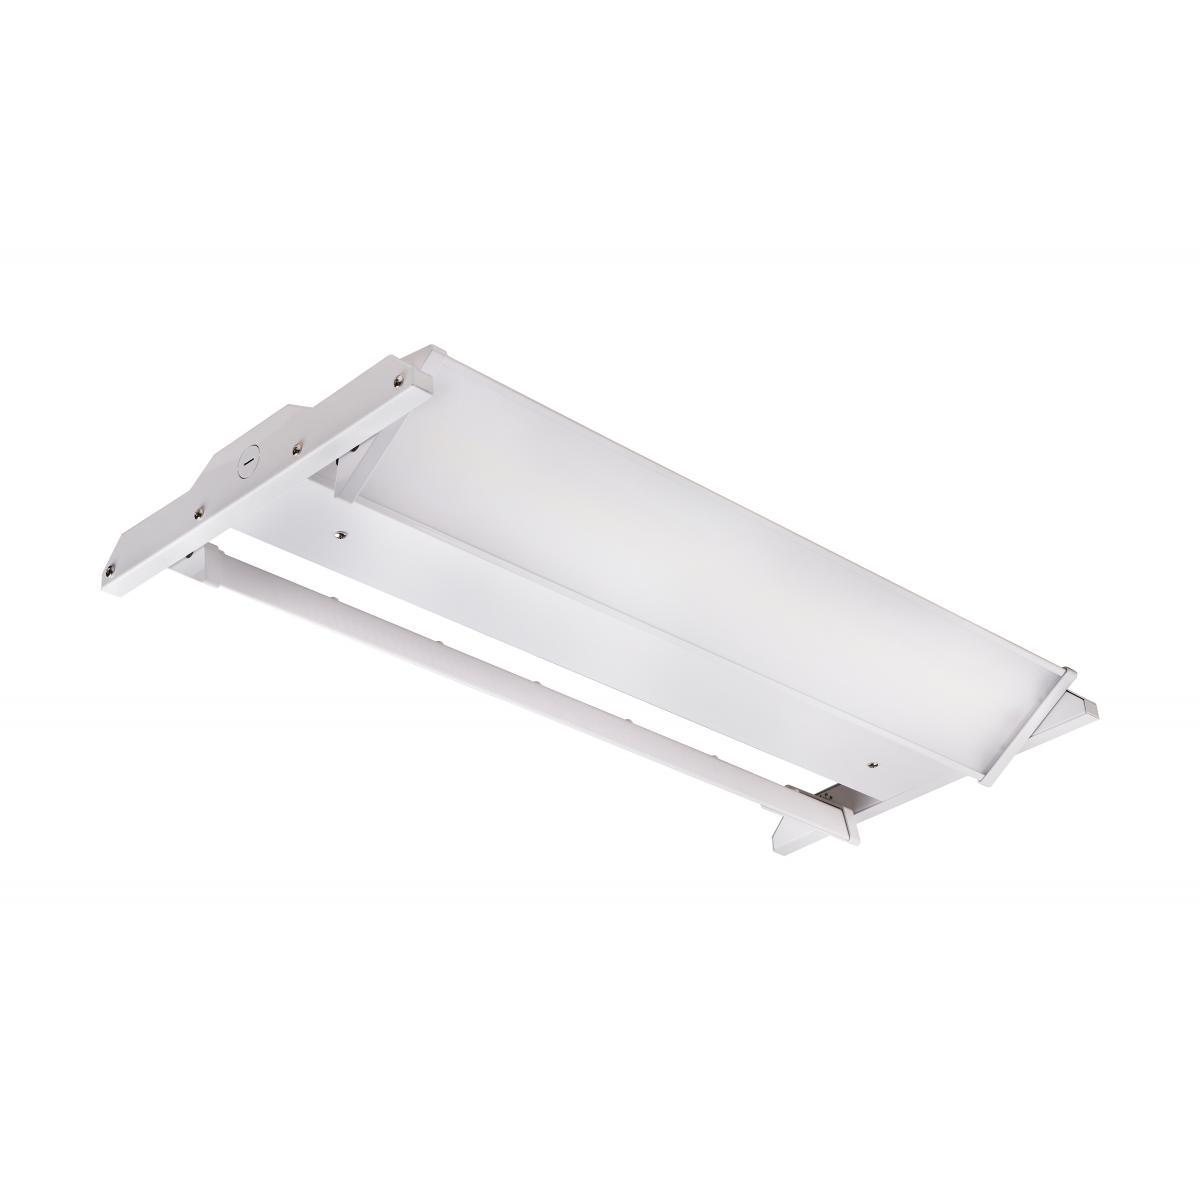 65-645 165W LED ADJUSTABLE HIGH BAY